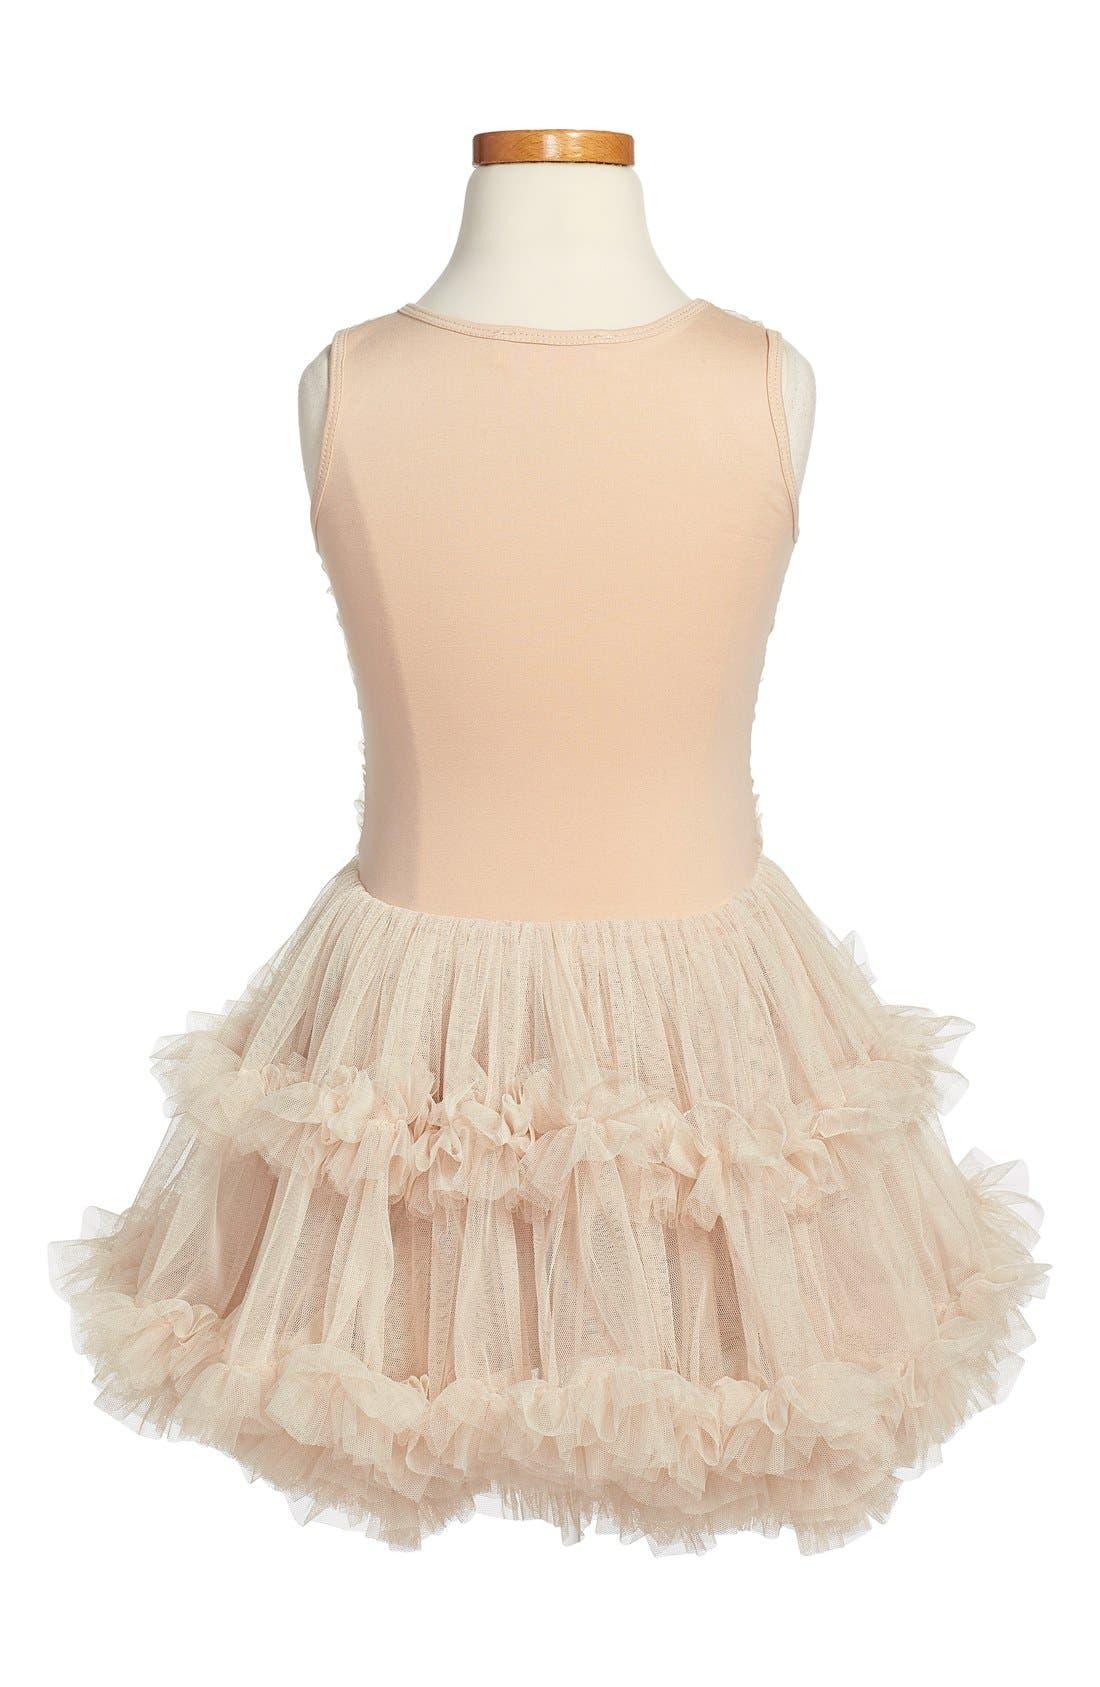 POPATU, Ribbon Rosette Sleeveless Dress, Alternate thumbnail 2, color, IVORY